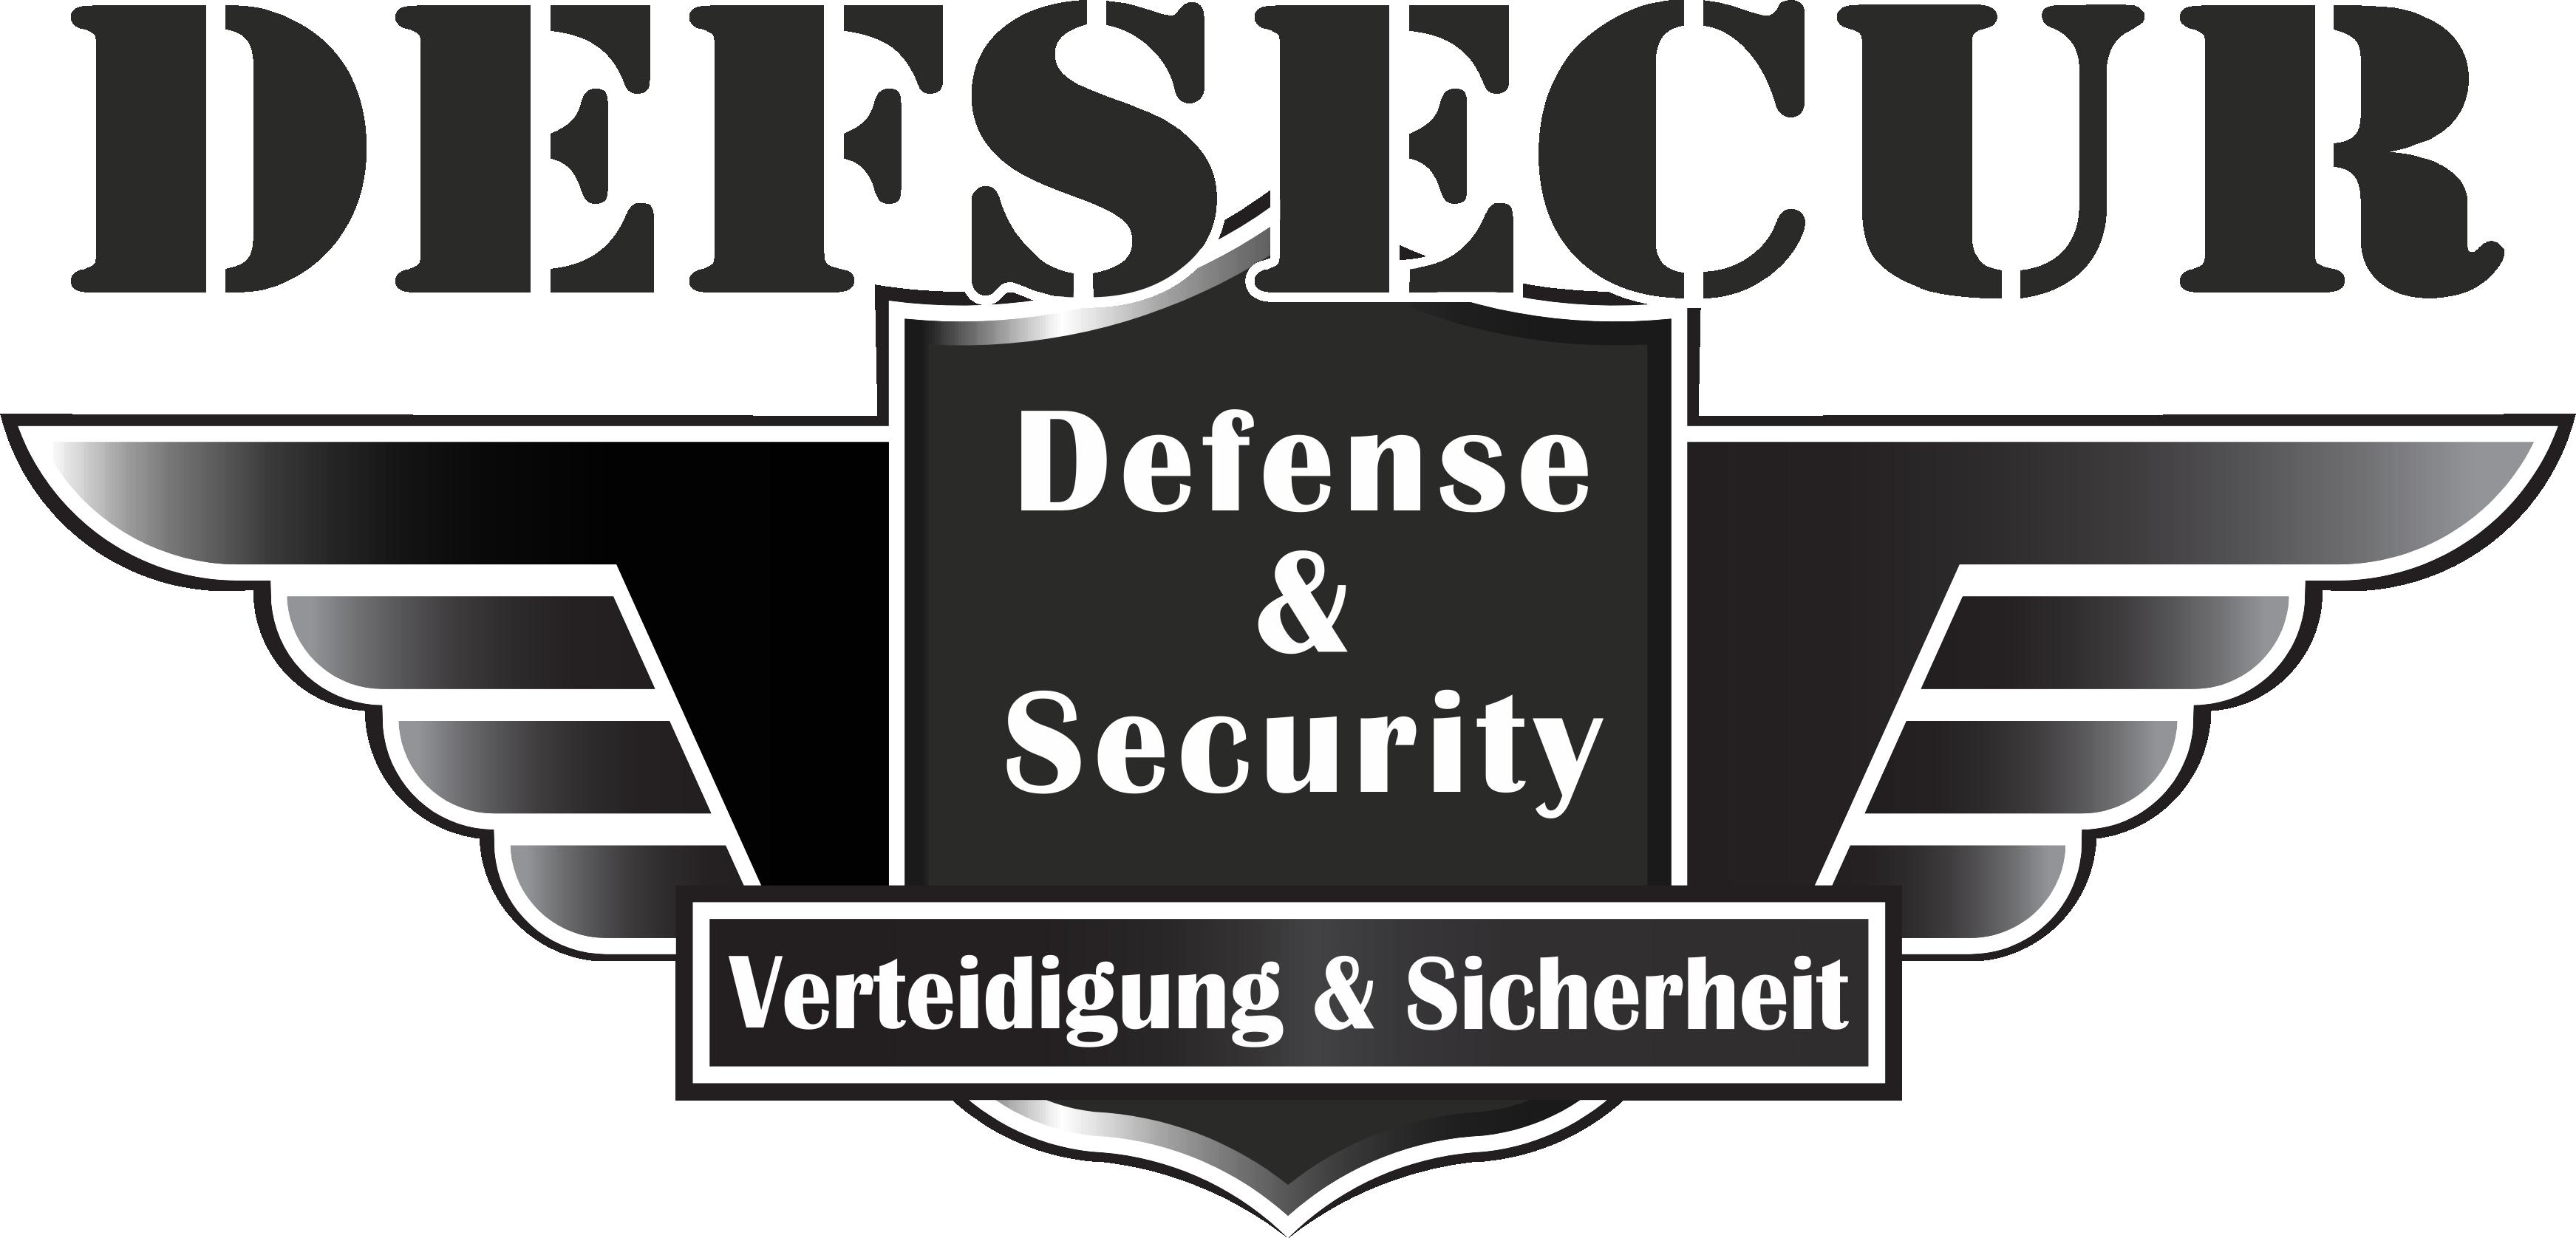 Defsecur - Defense & Security